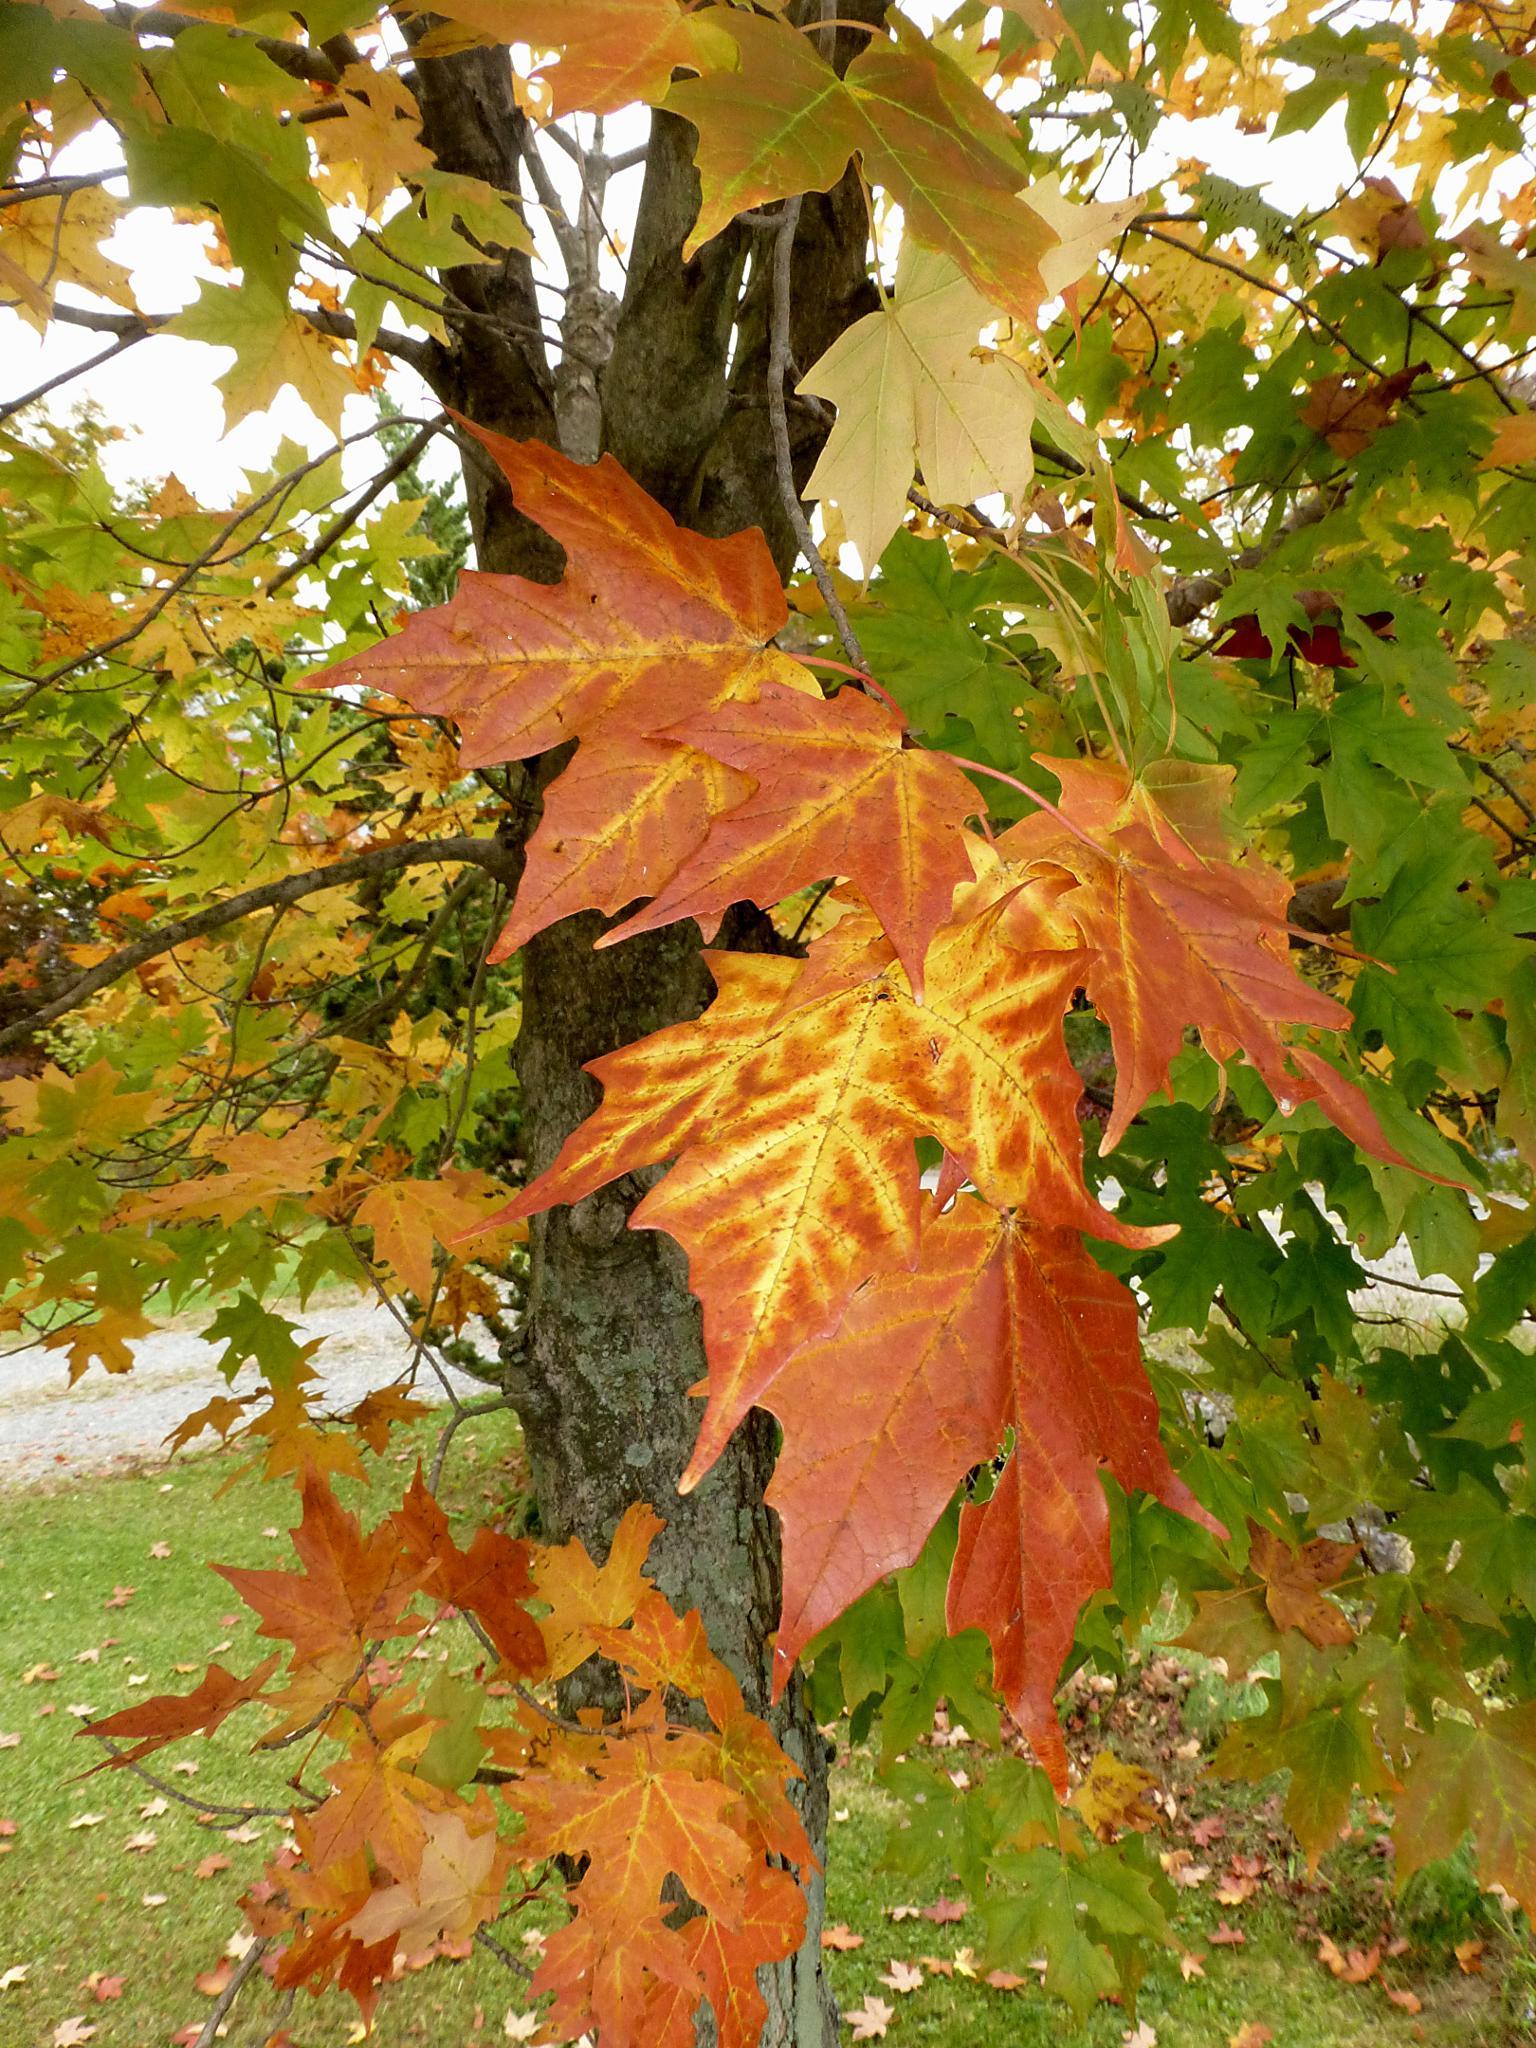 Autumn is in the Air by Terri Scache Harris